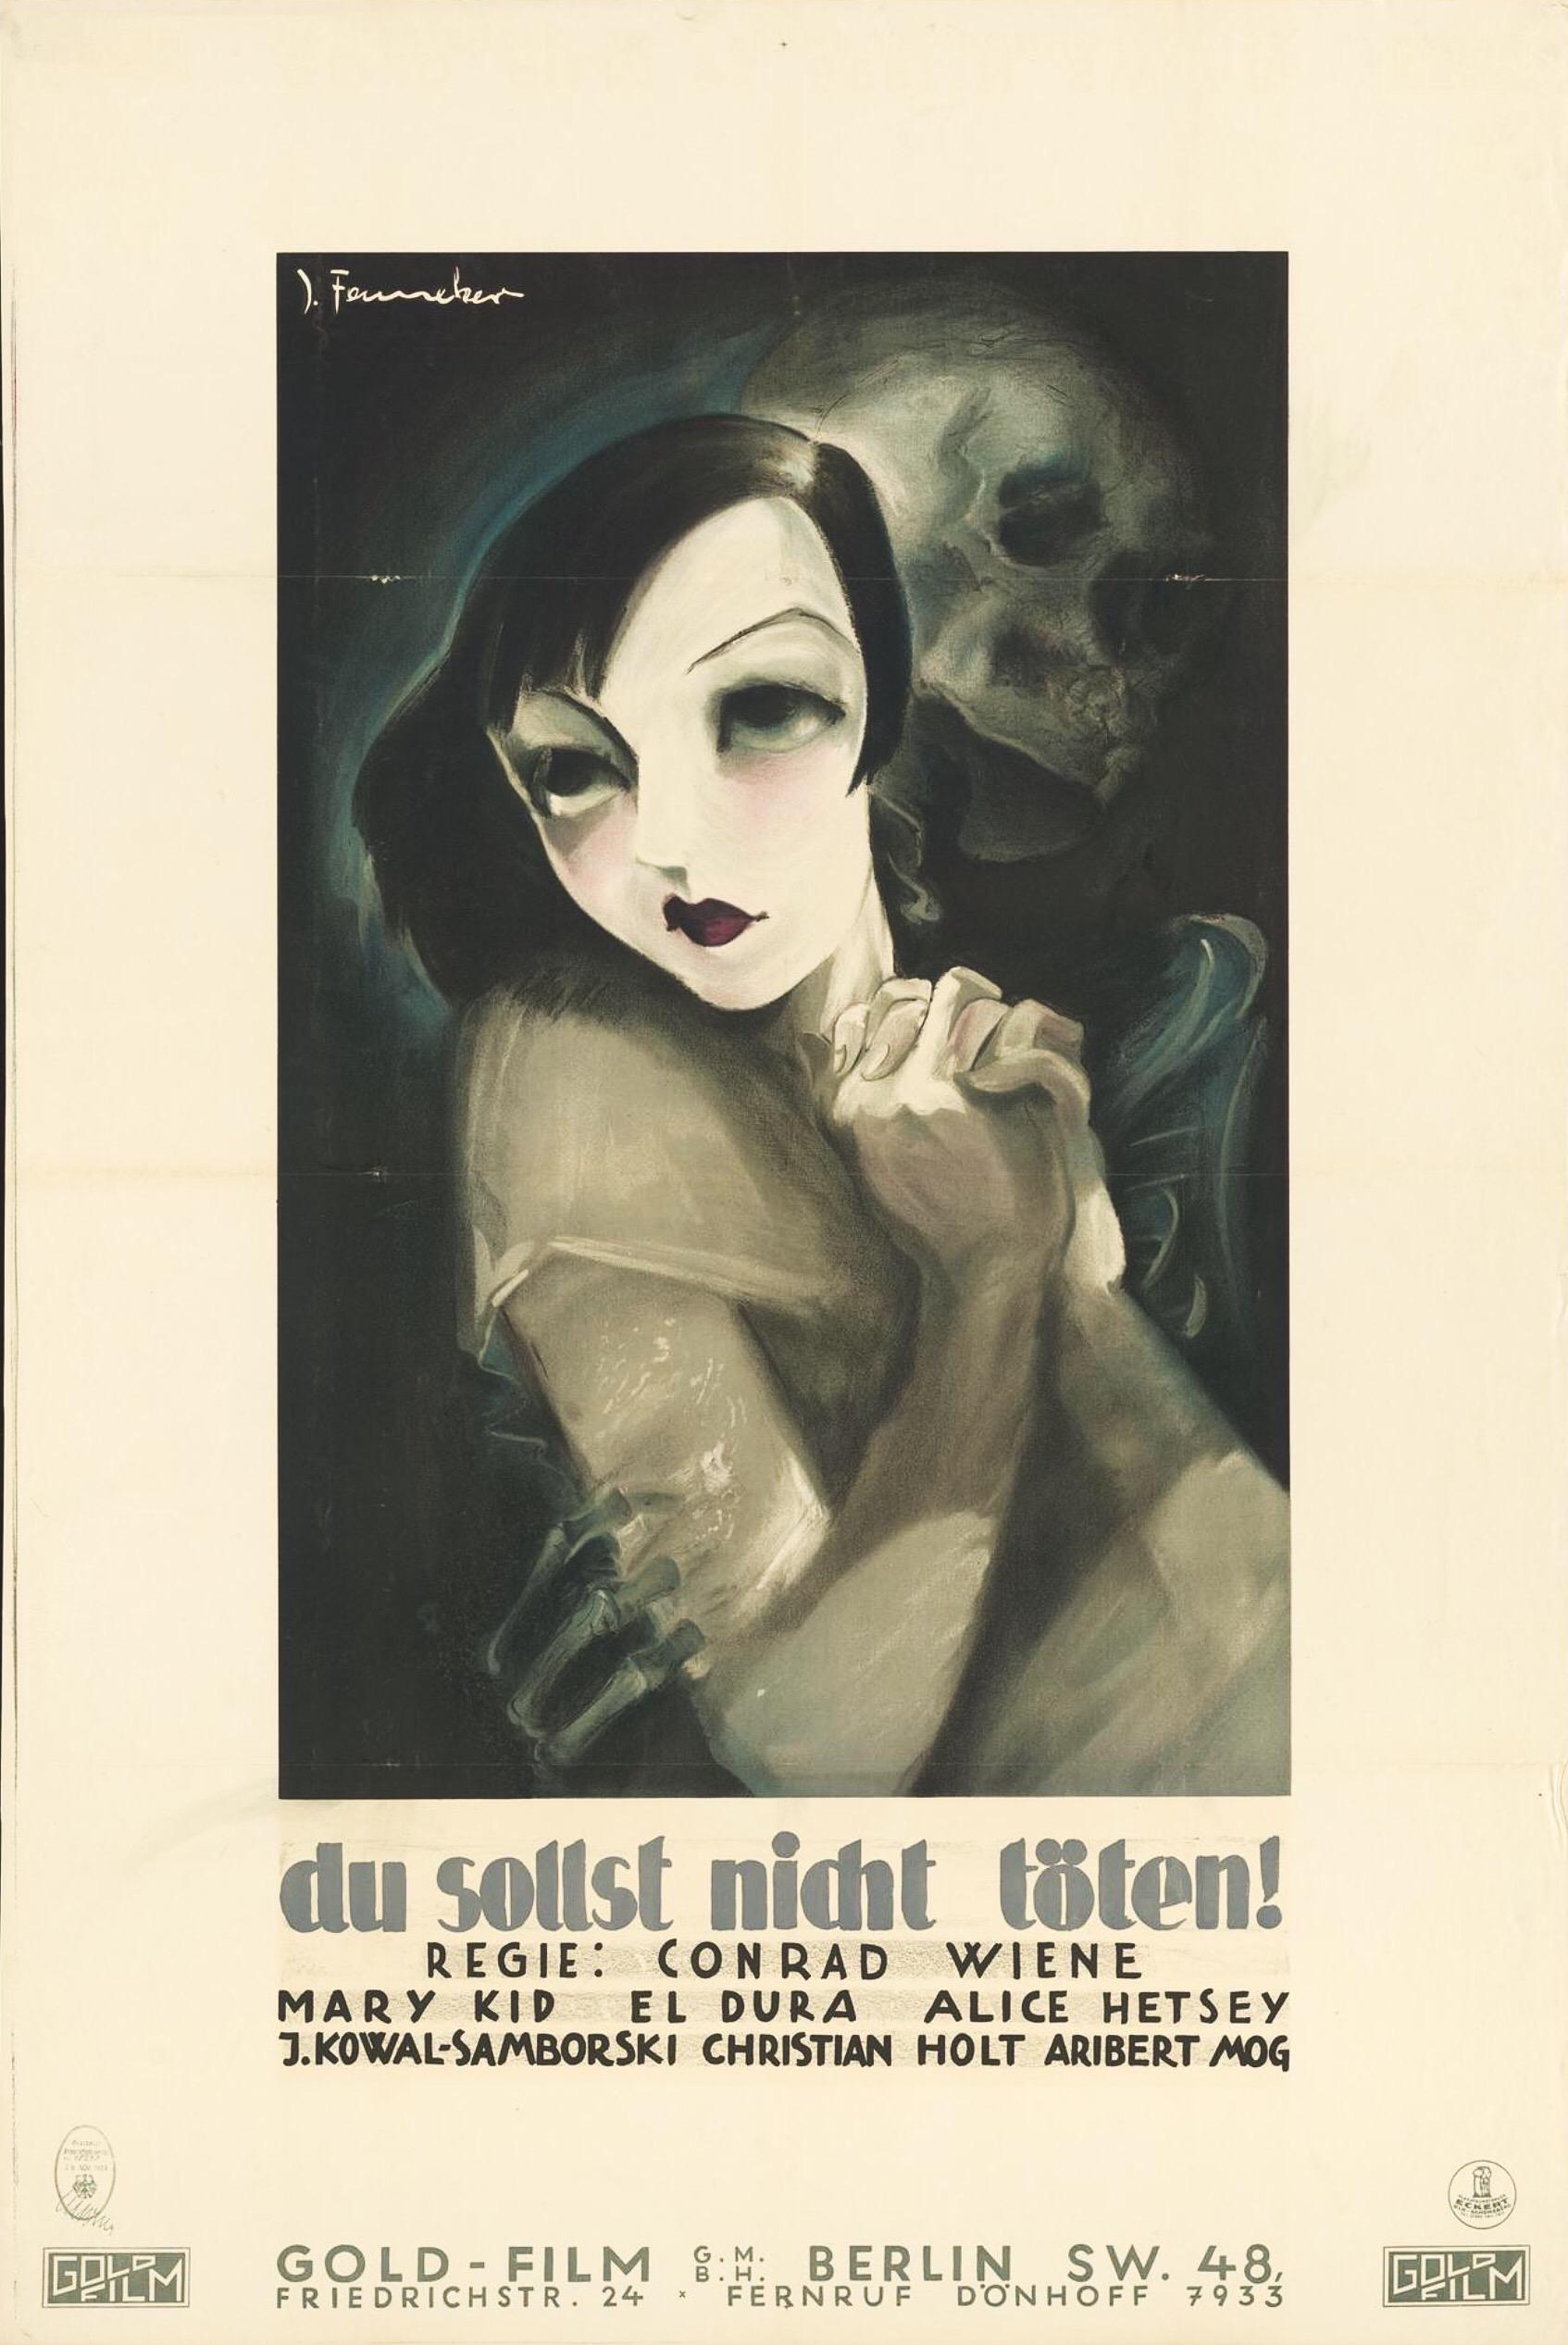 El' Dura, Mary Kid, Ivan Koval-Samborsky, Aribert Mog, Conrad Wiene, Alice Hetsey, Christian Holt, and J. Fenneker in Eine Dirne ist ermordet worden (1930)